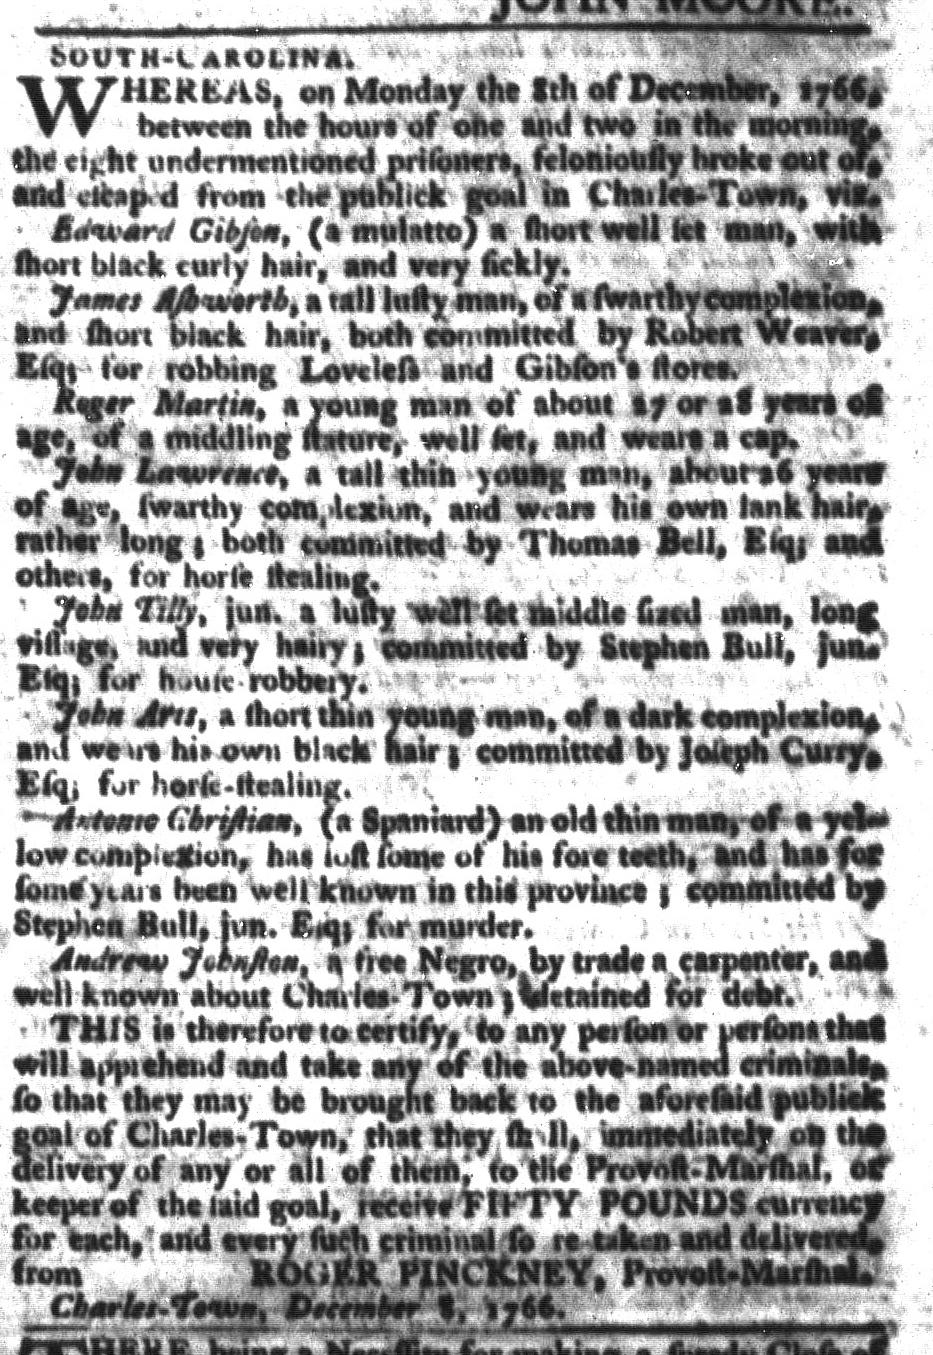 jan-6-south-carolina-gazette-and-country-journal-supplement-slavery-5